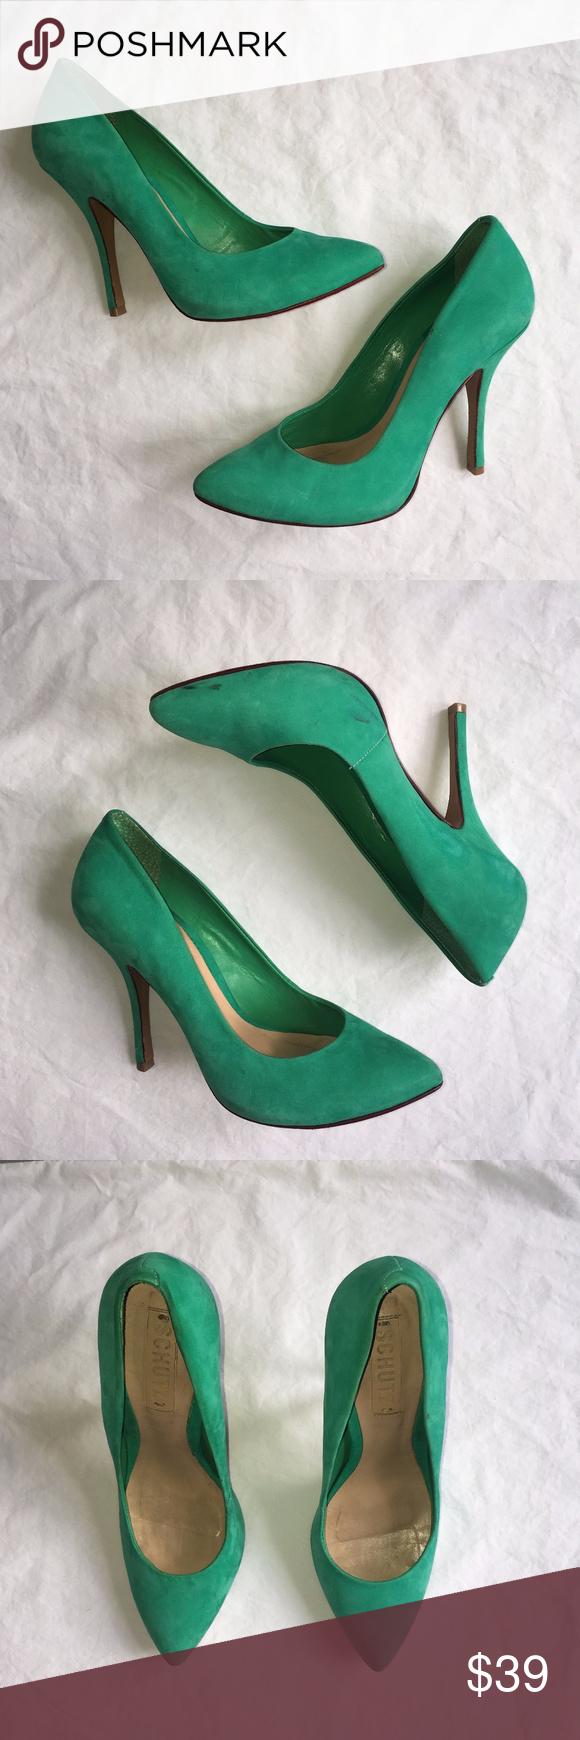 Schutz Suede Teal Green High Heels Size 8 Green High Heels Heels High Heels